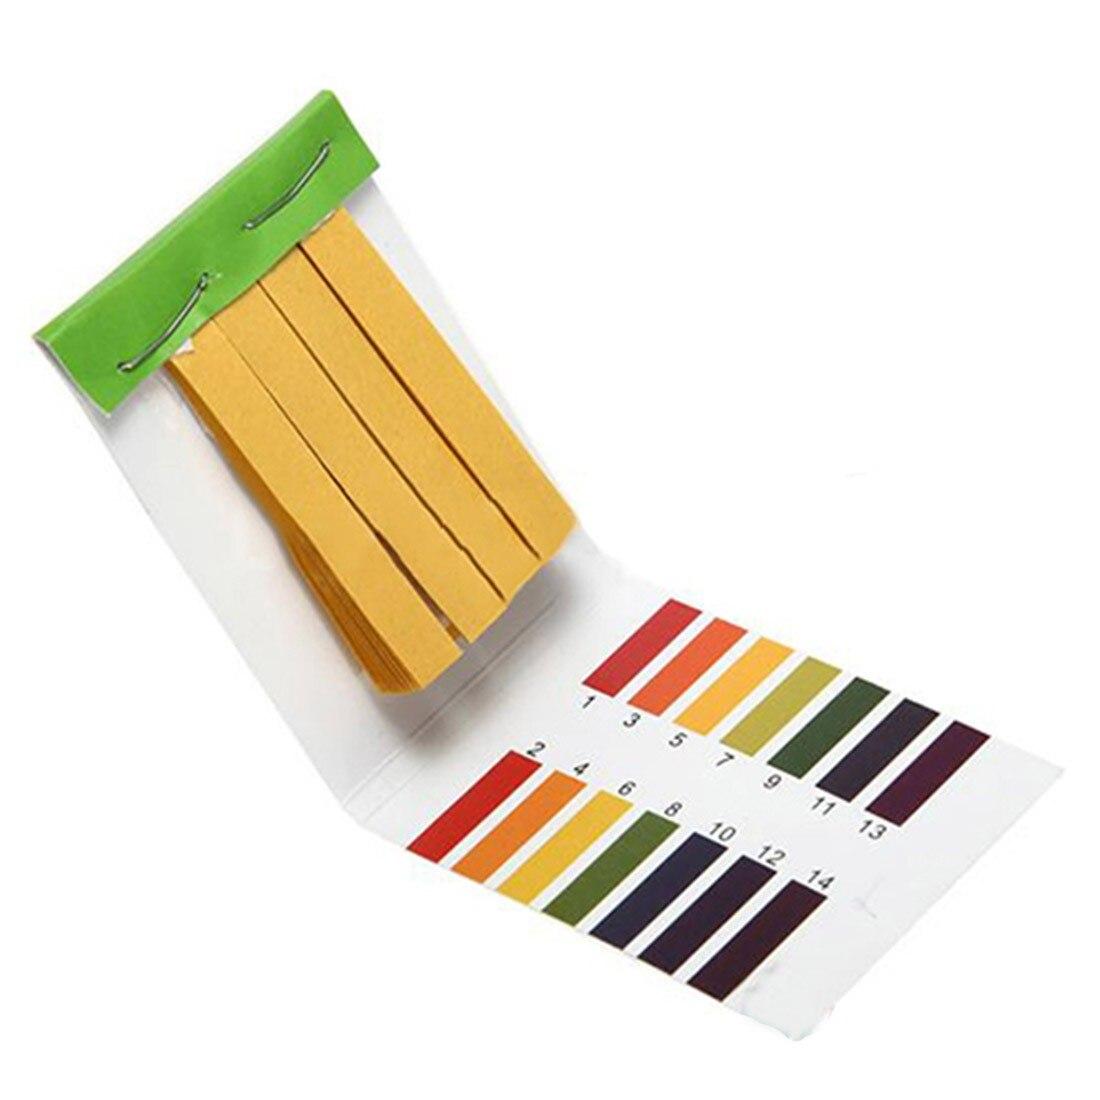 Measuring Tool 80 Strips/pack pH test strips PH Meter PH Controller Range 1-14st Indicator Litmus Paper Water Soilsting Kit цены